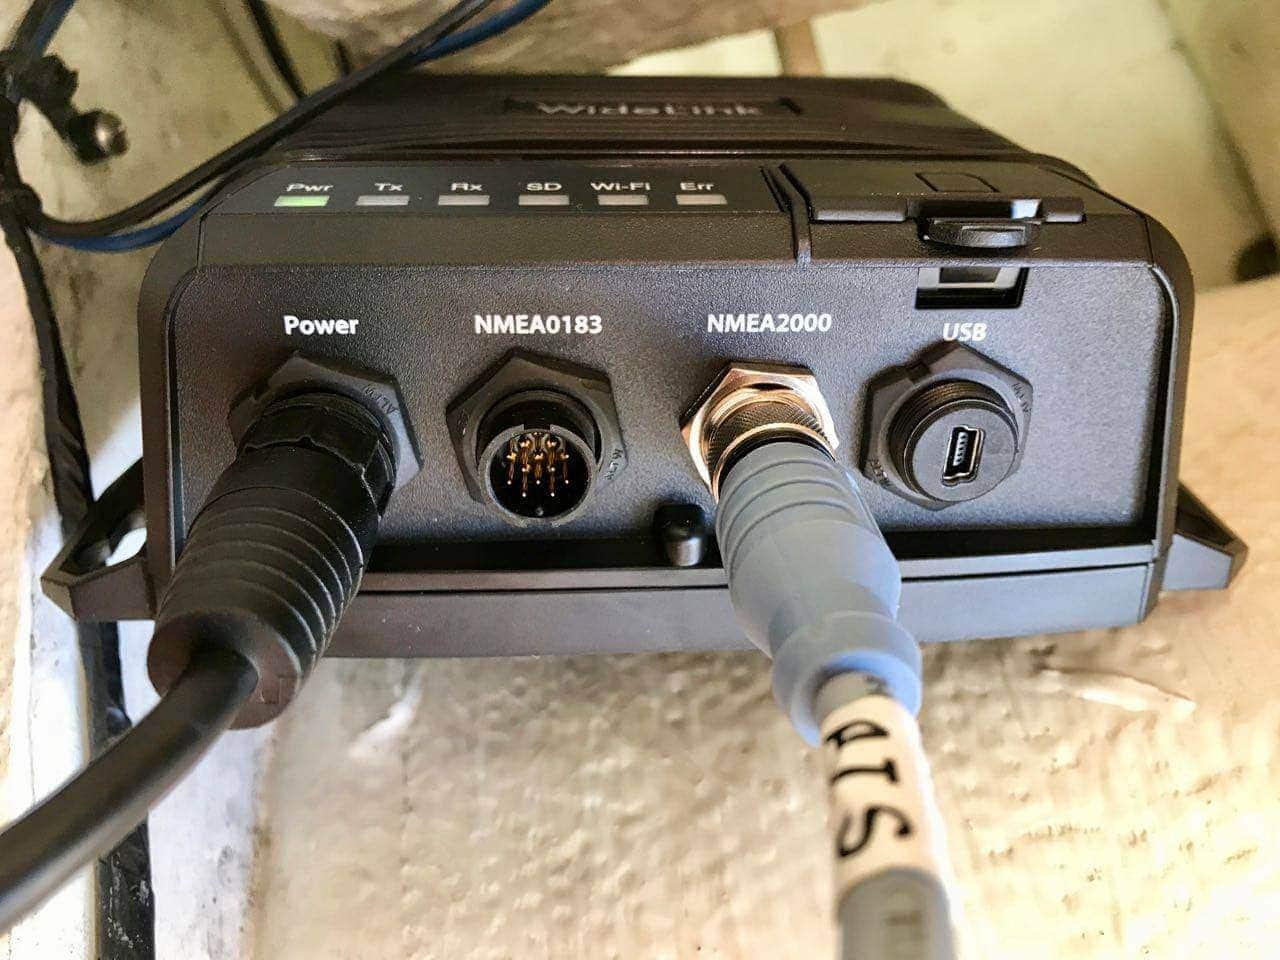 AMEC-WideLink-B600-CLASS-B-SOTDMA-AIS-TRANSPONDER-power-plugs